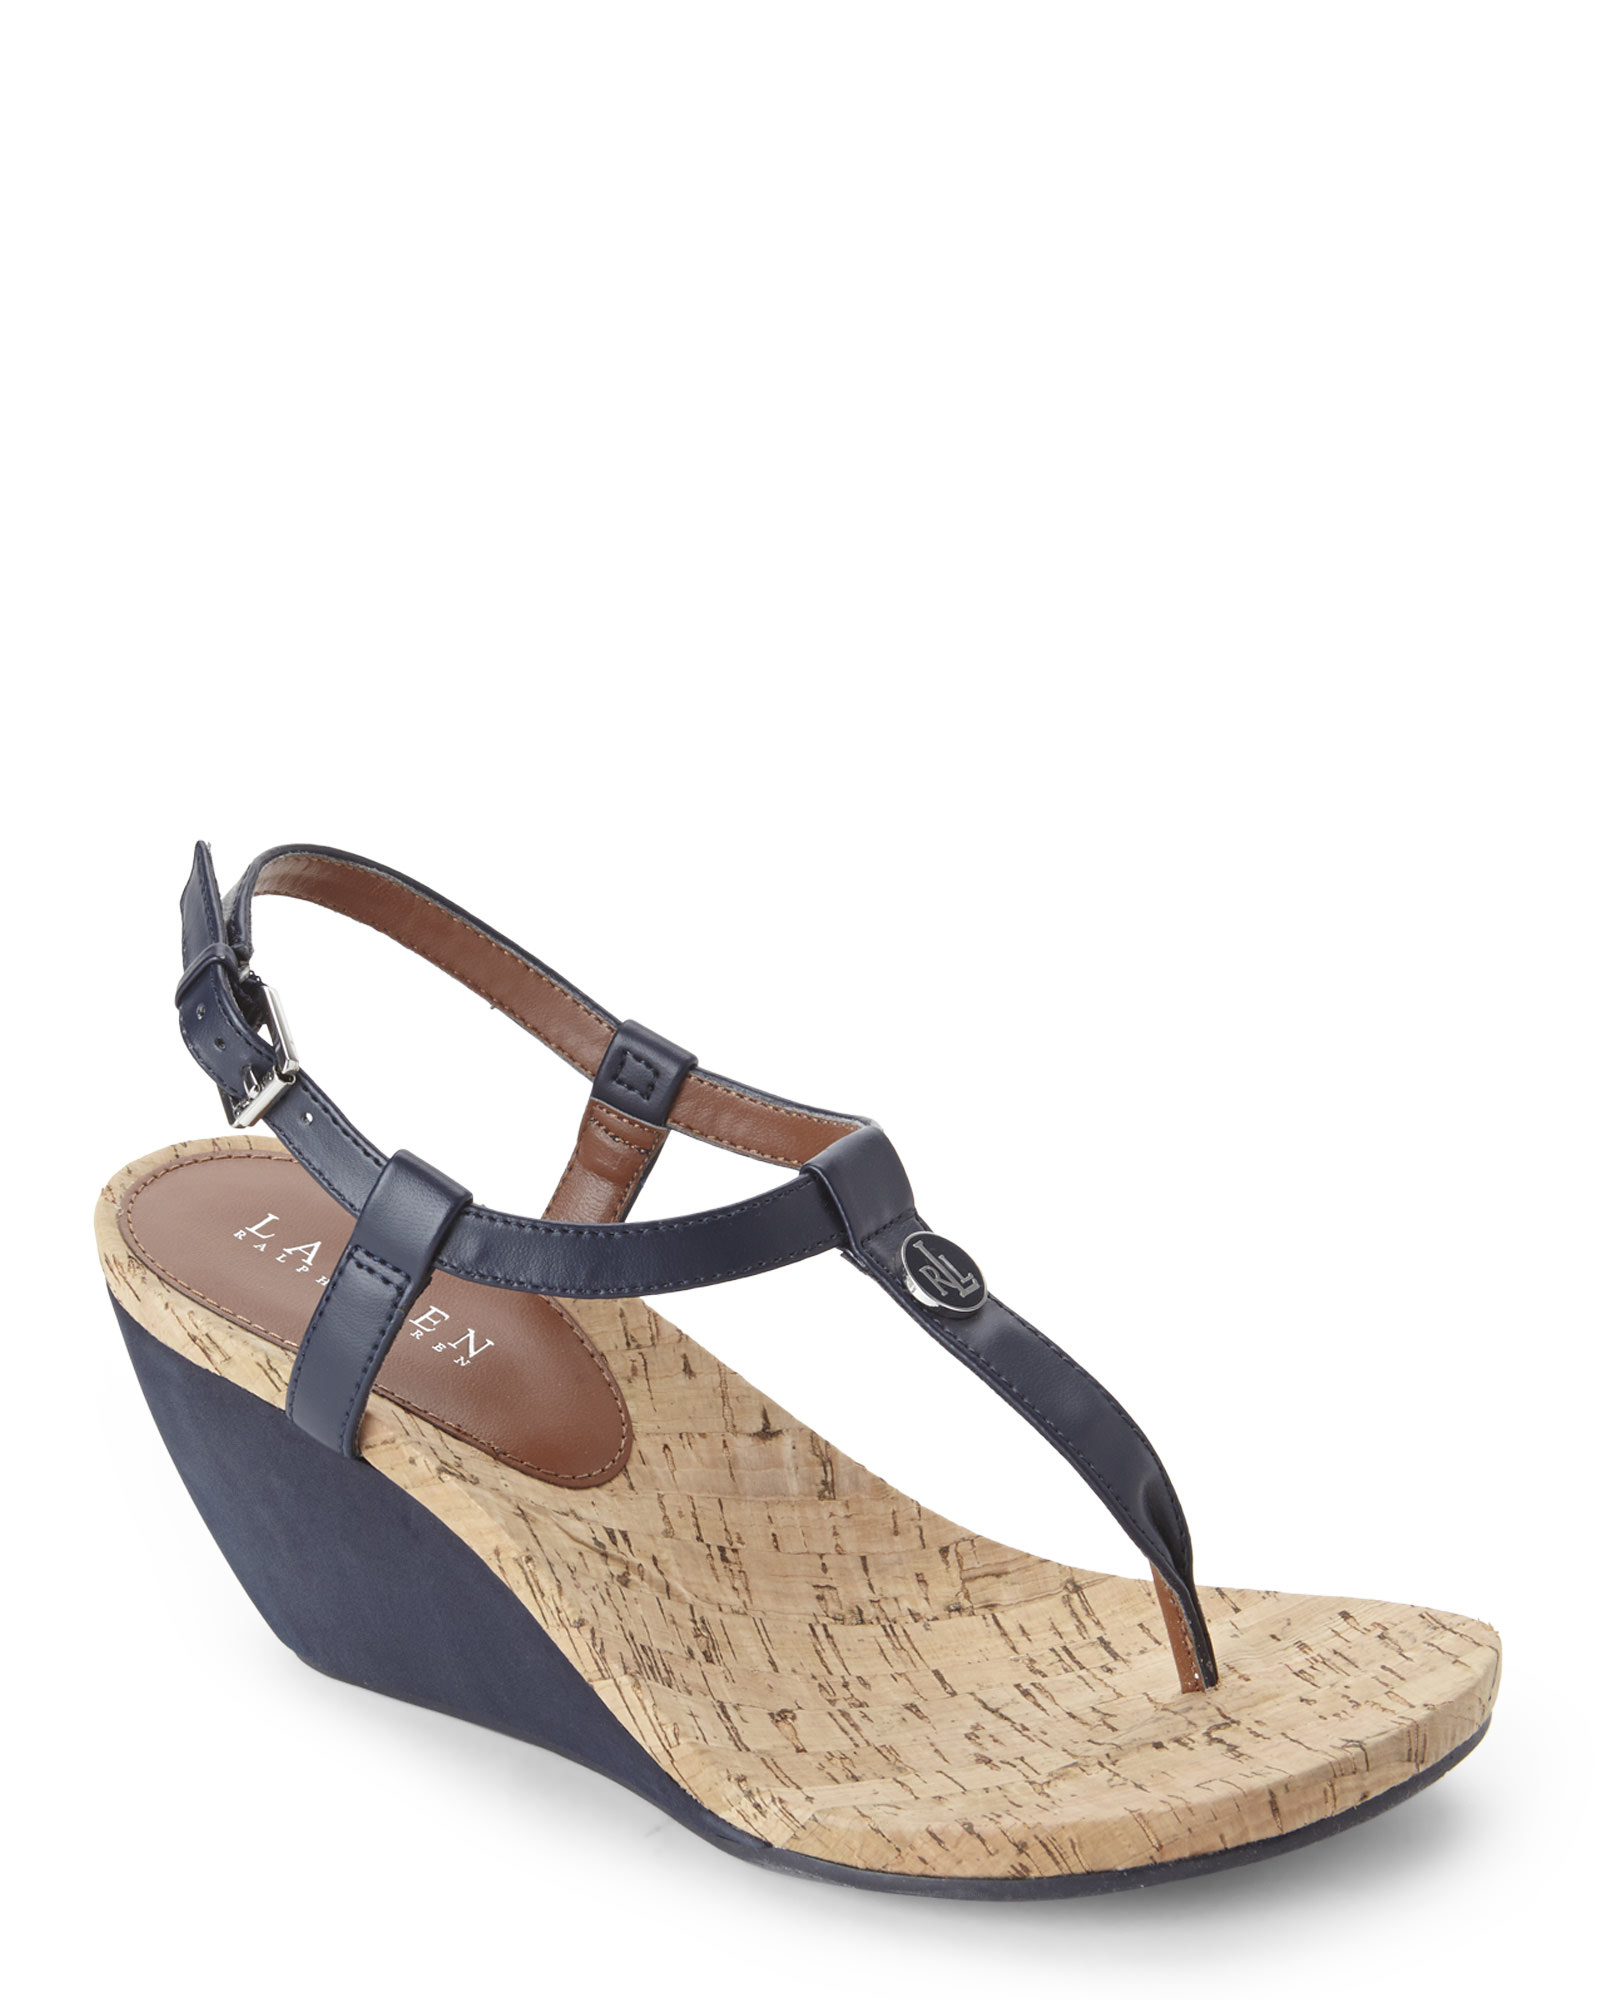 9ffbd0403582 Lyst - Ralph Lauren Reeta Wedge Thong Sandals in Blue